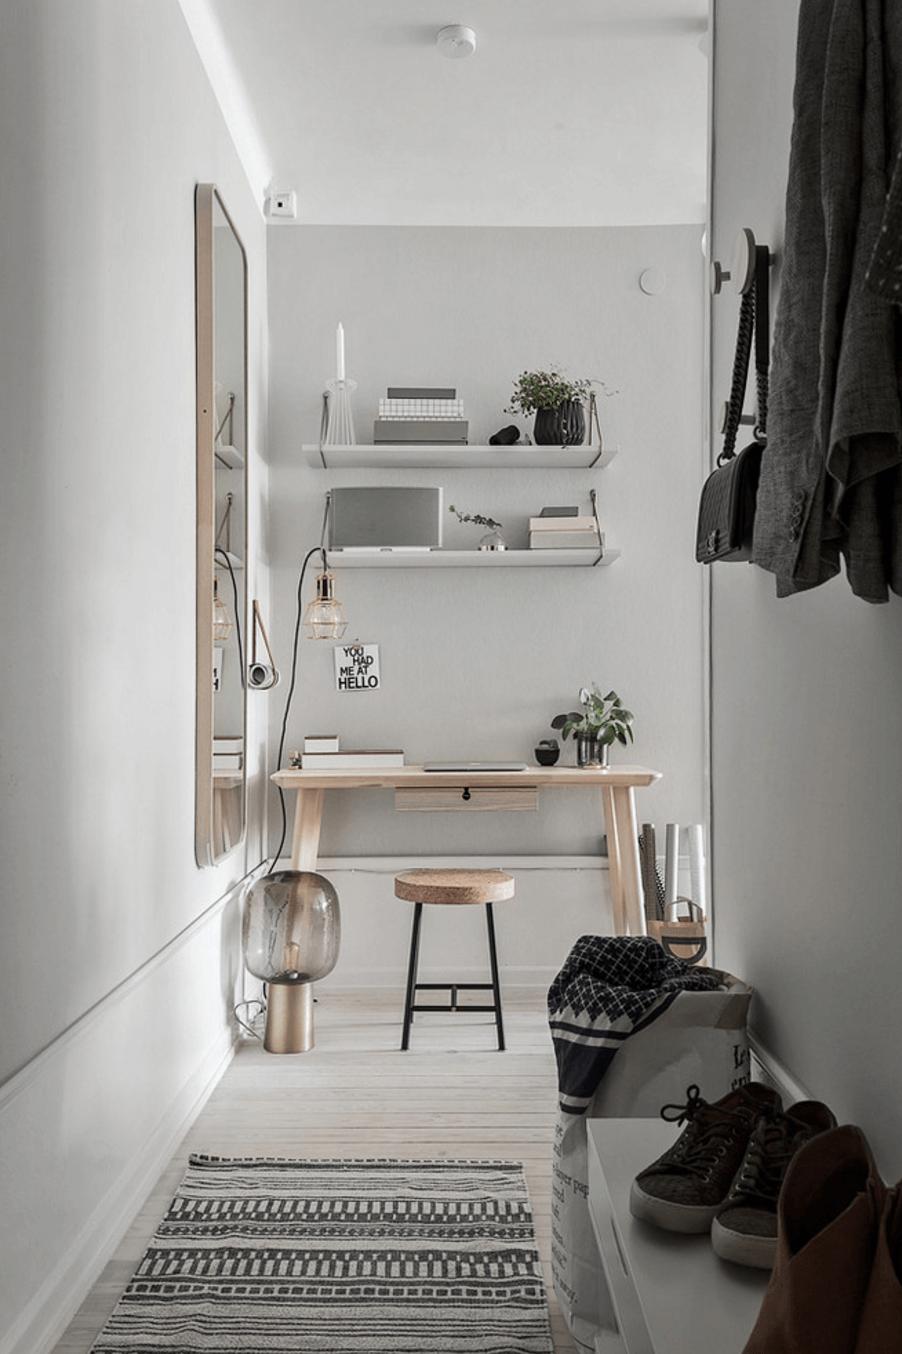 Memanfaatkan salah satu sudut rumah menjadi ruang kerja (Sumber: freshome.com)